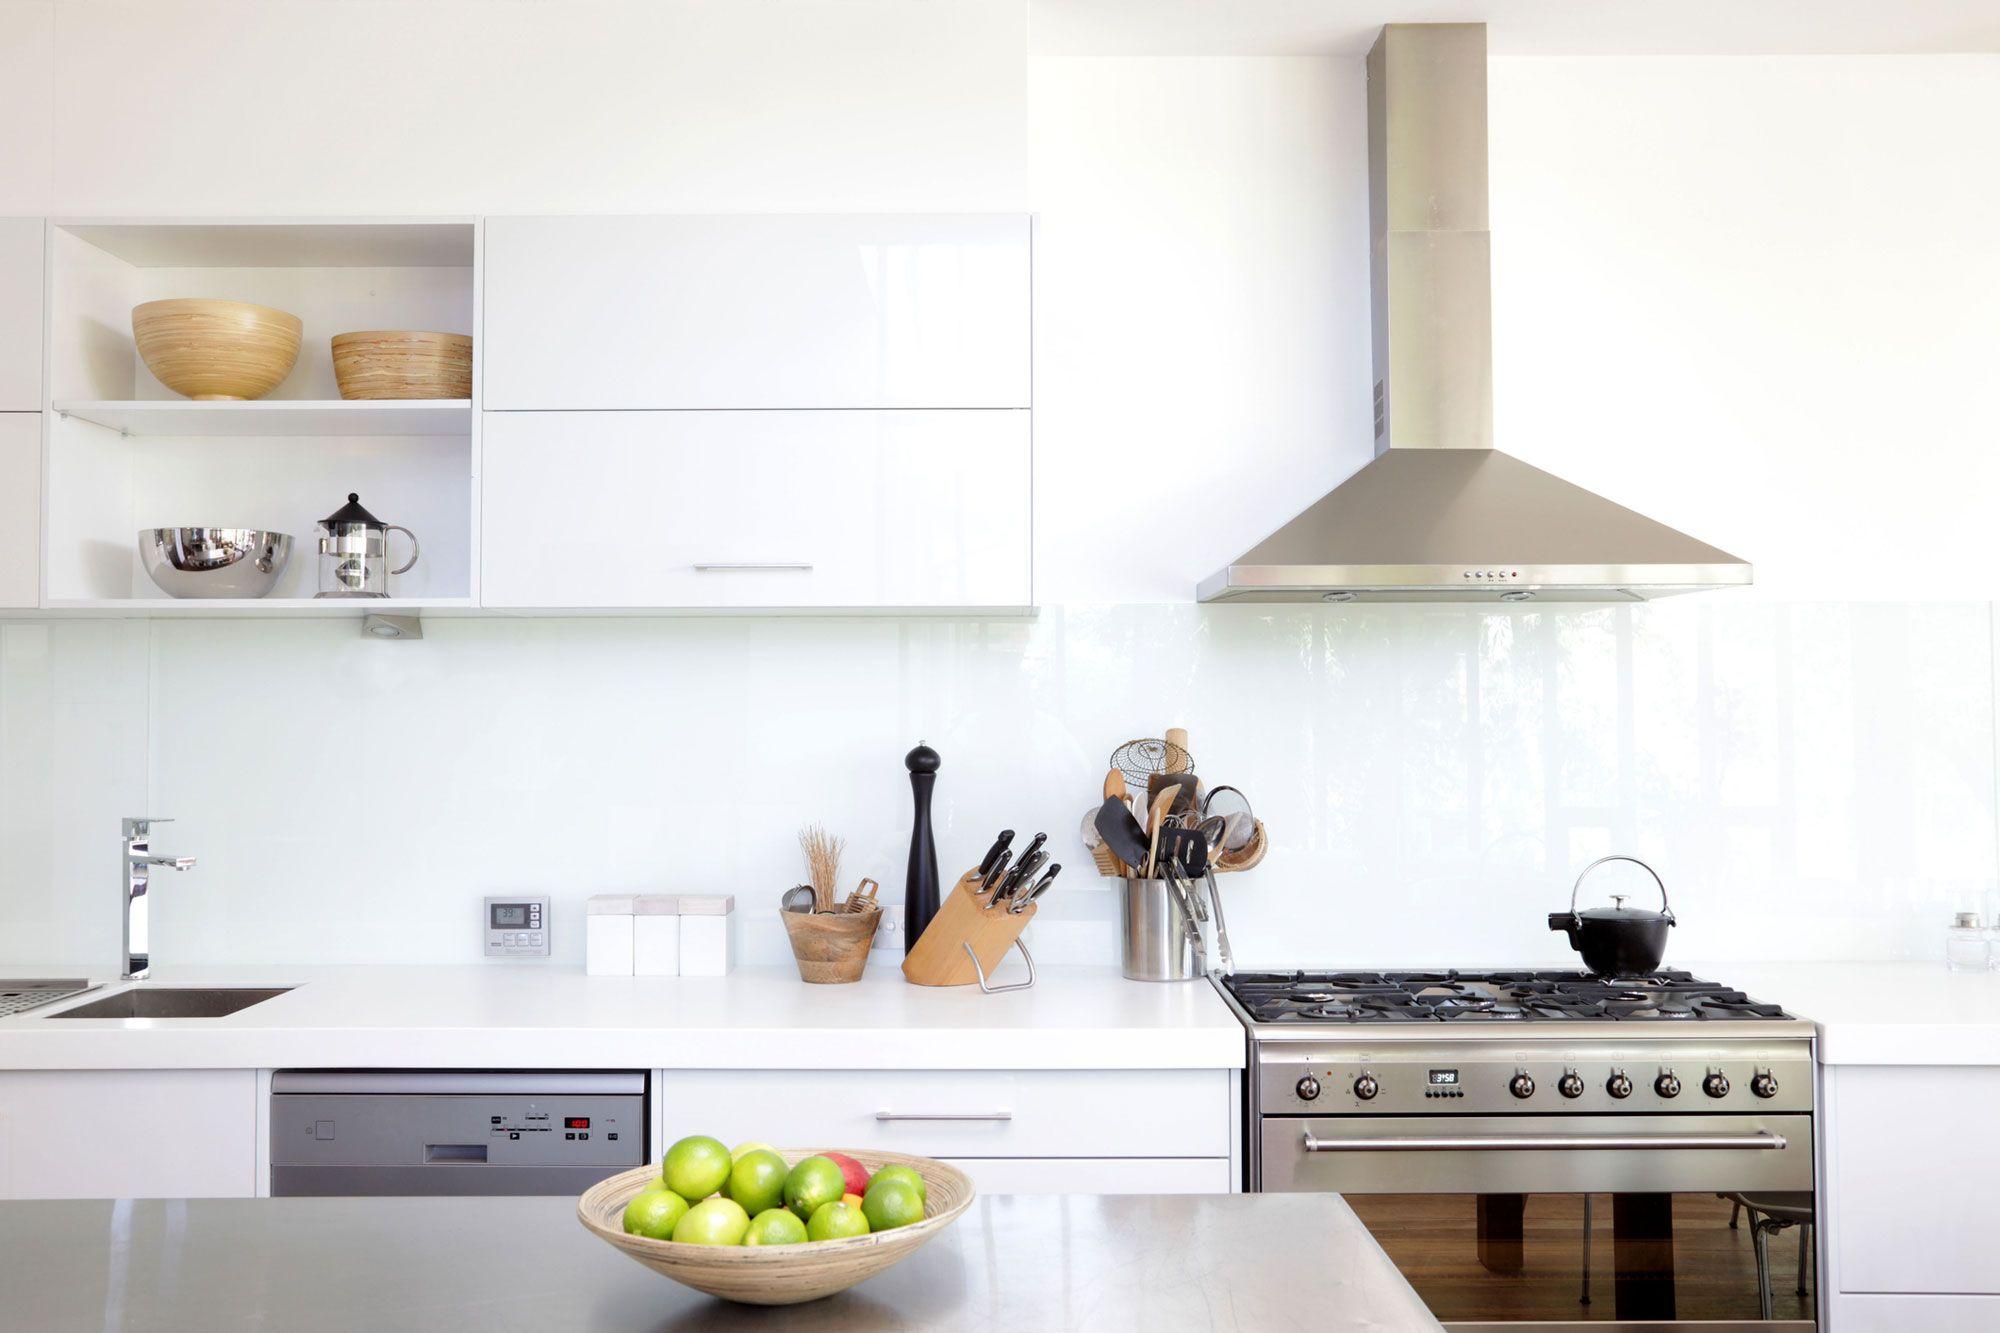 Hogar feng shui: conseguir una cocina tranquila